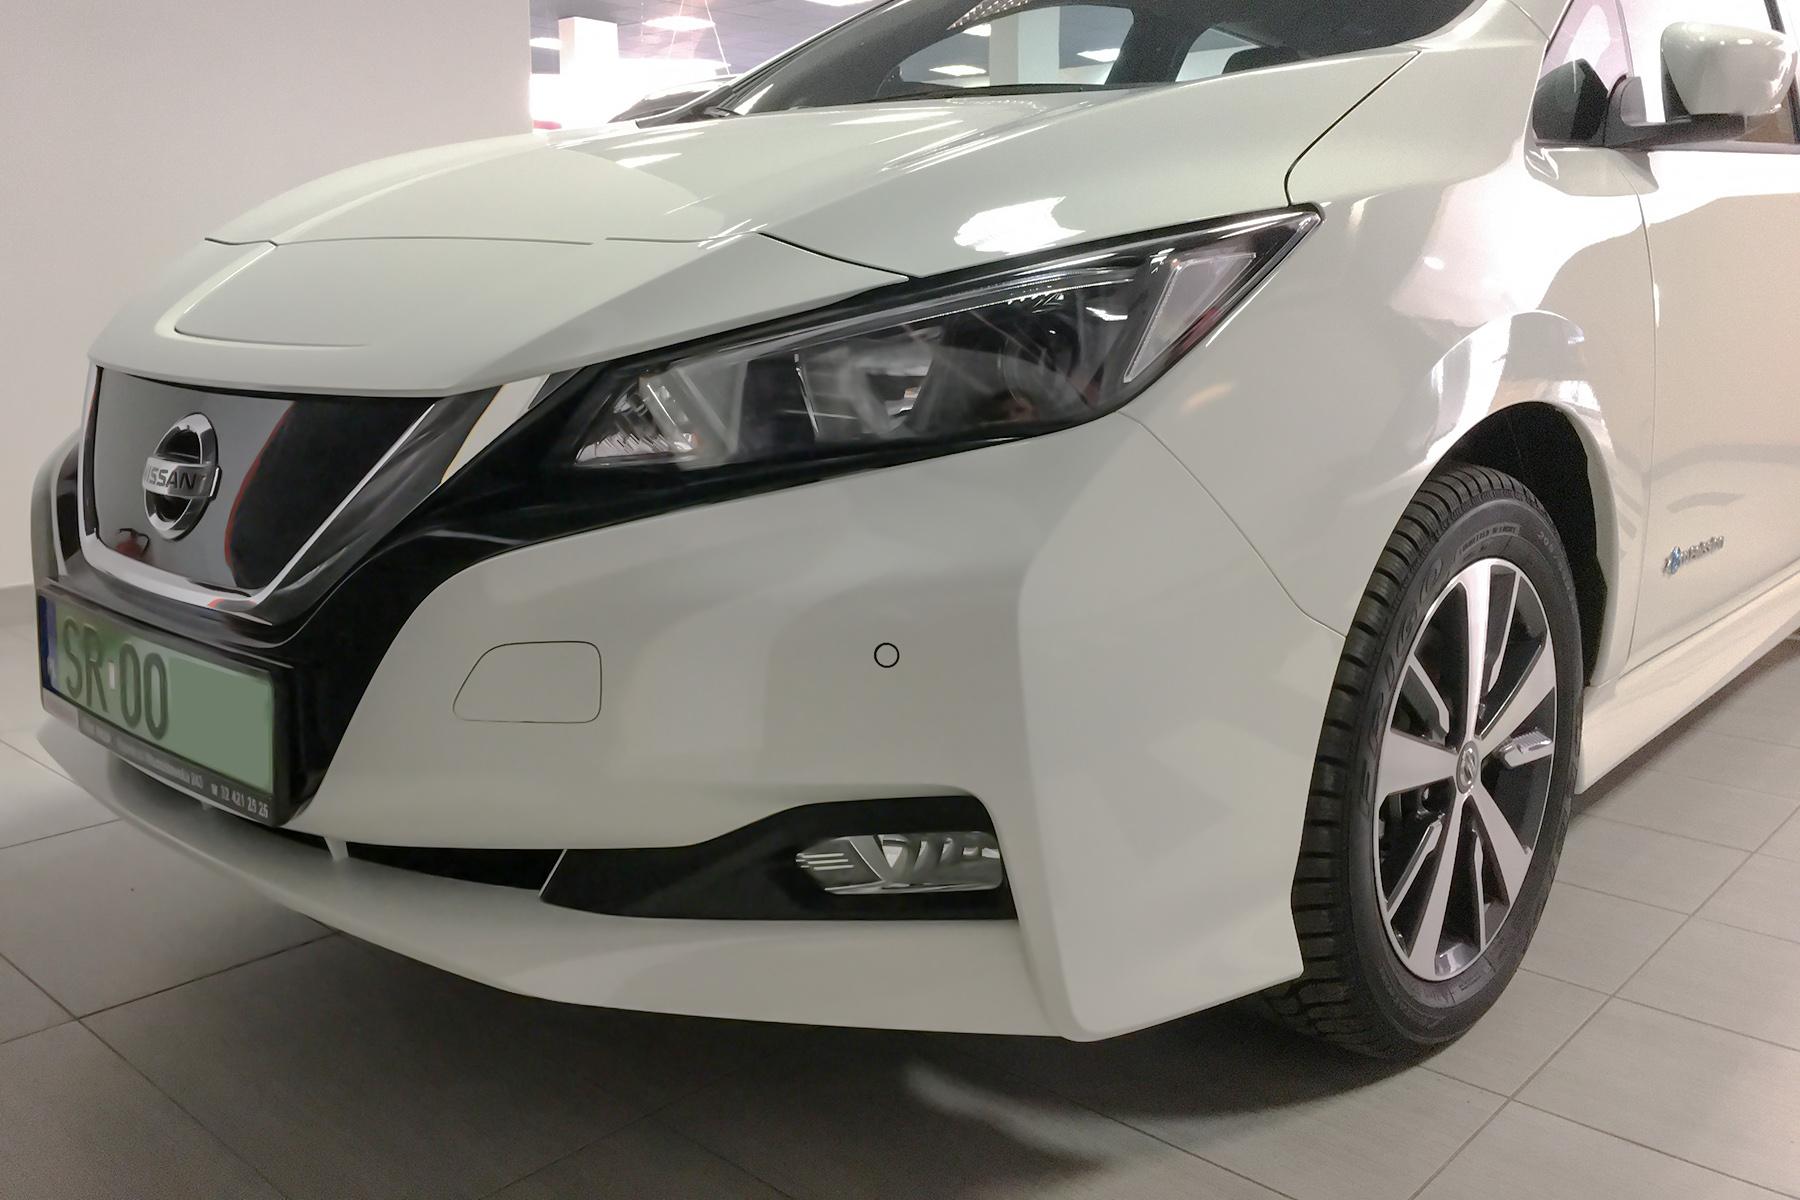 Nissan Leaf - zielone tablice